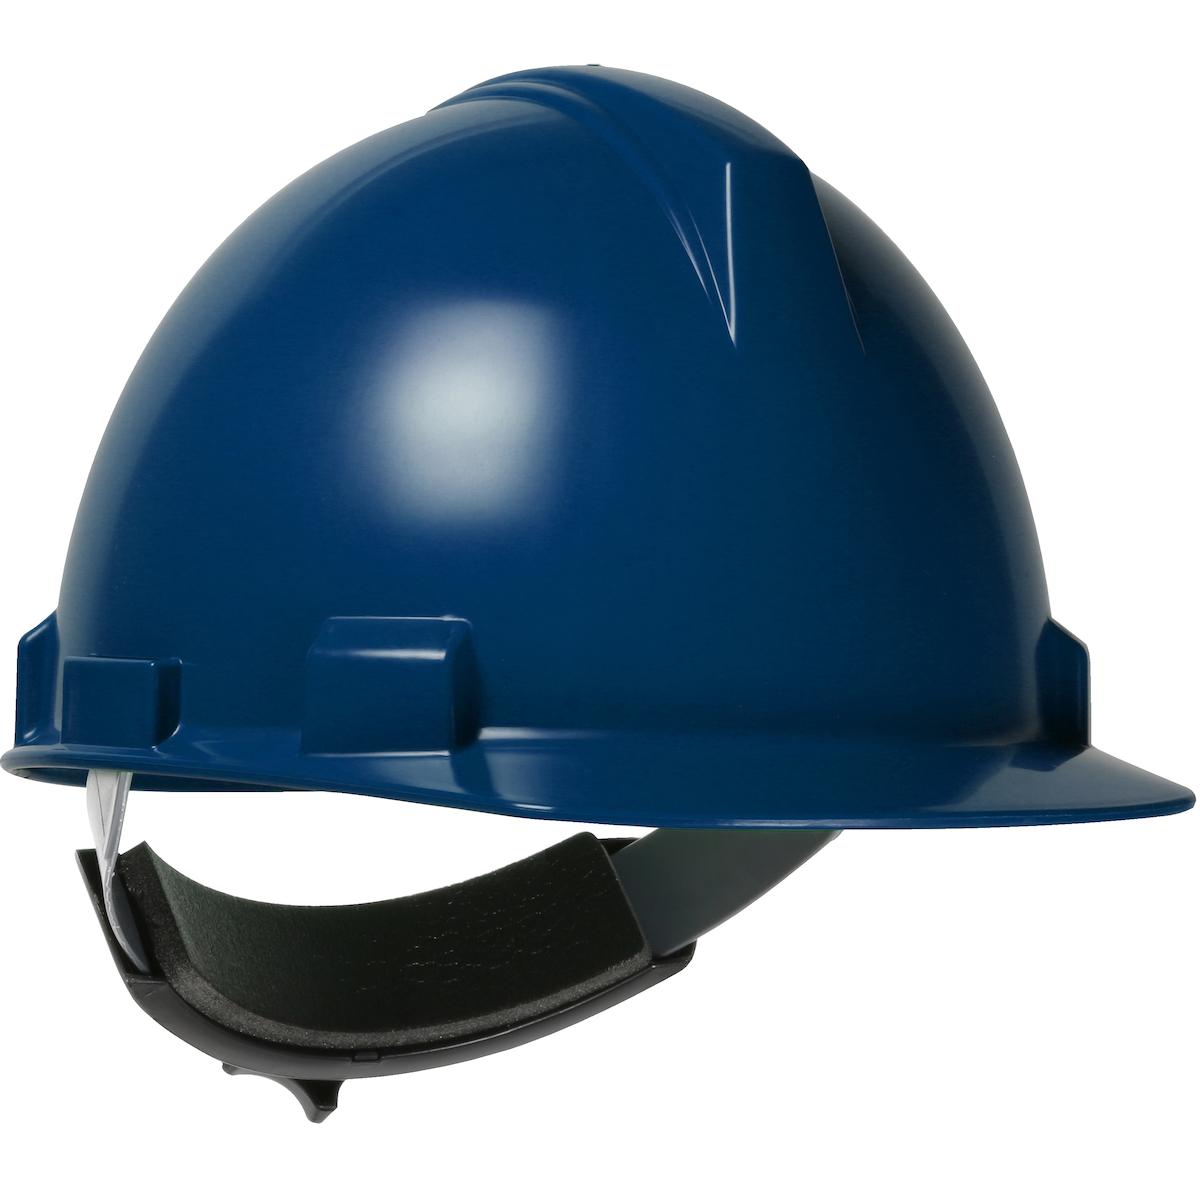 ANSI Type I Helmets